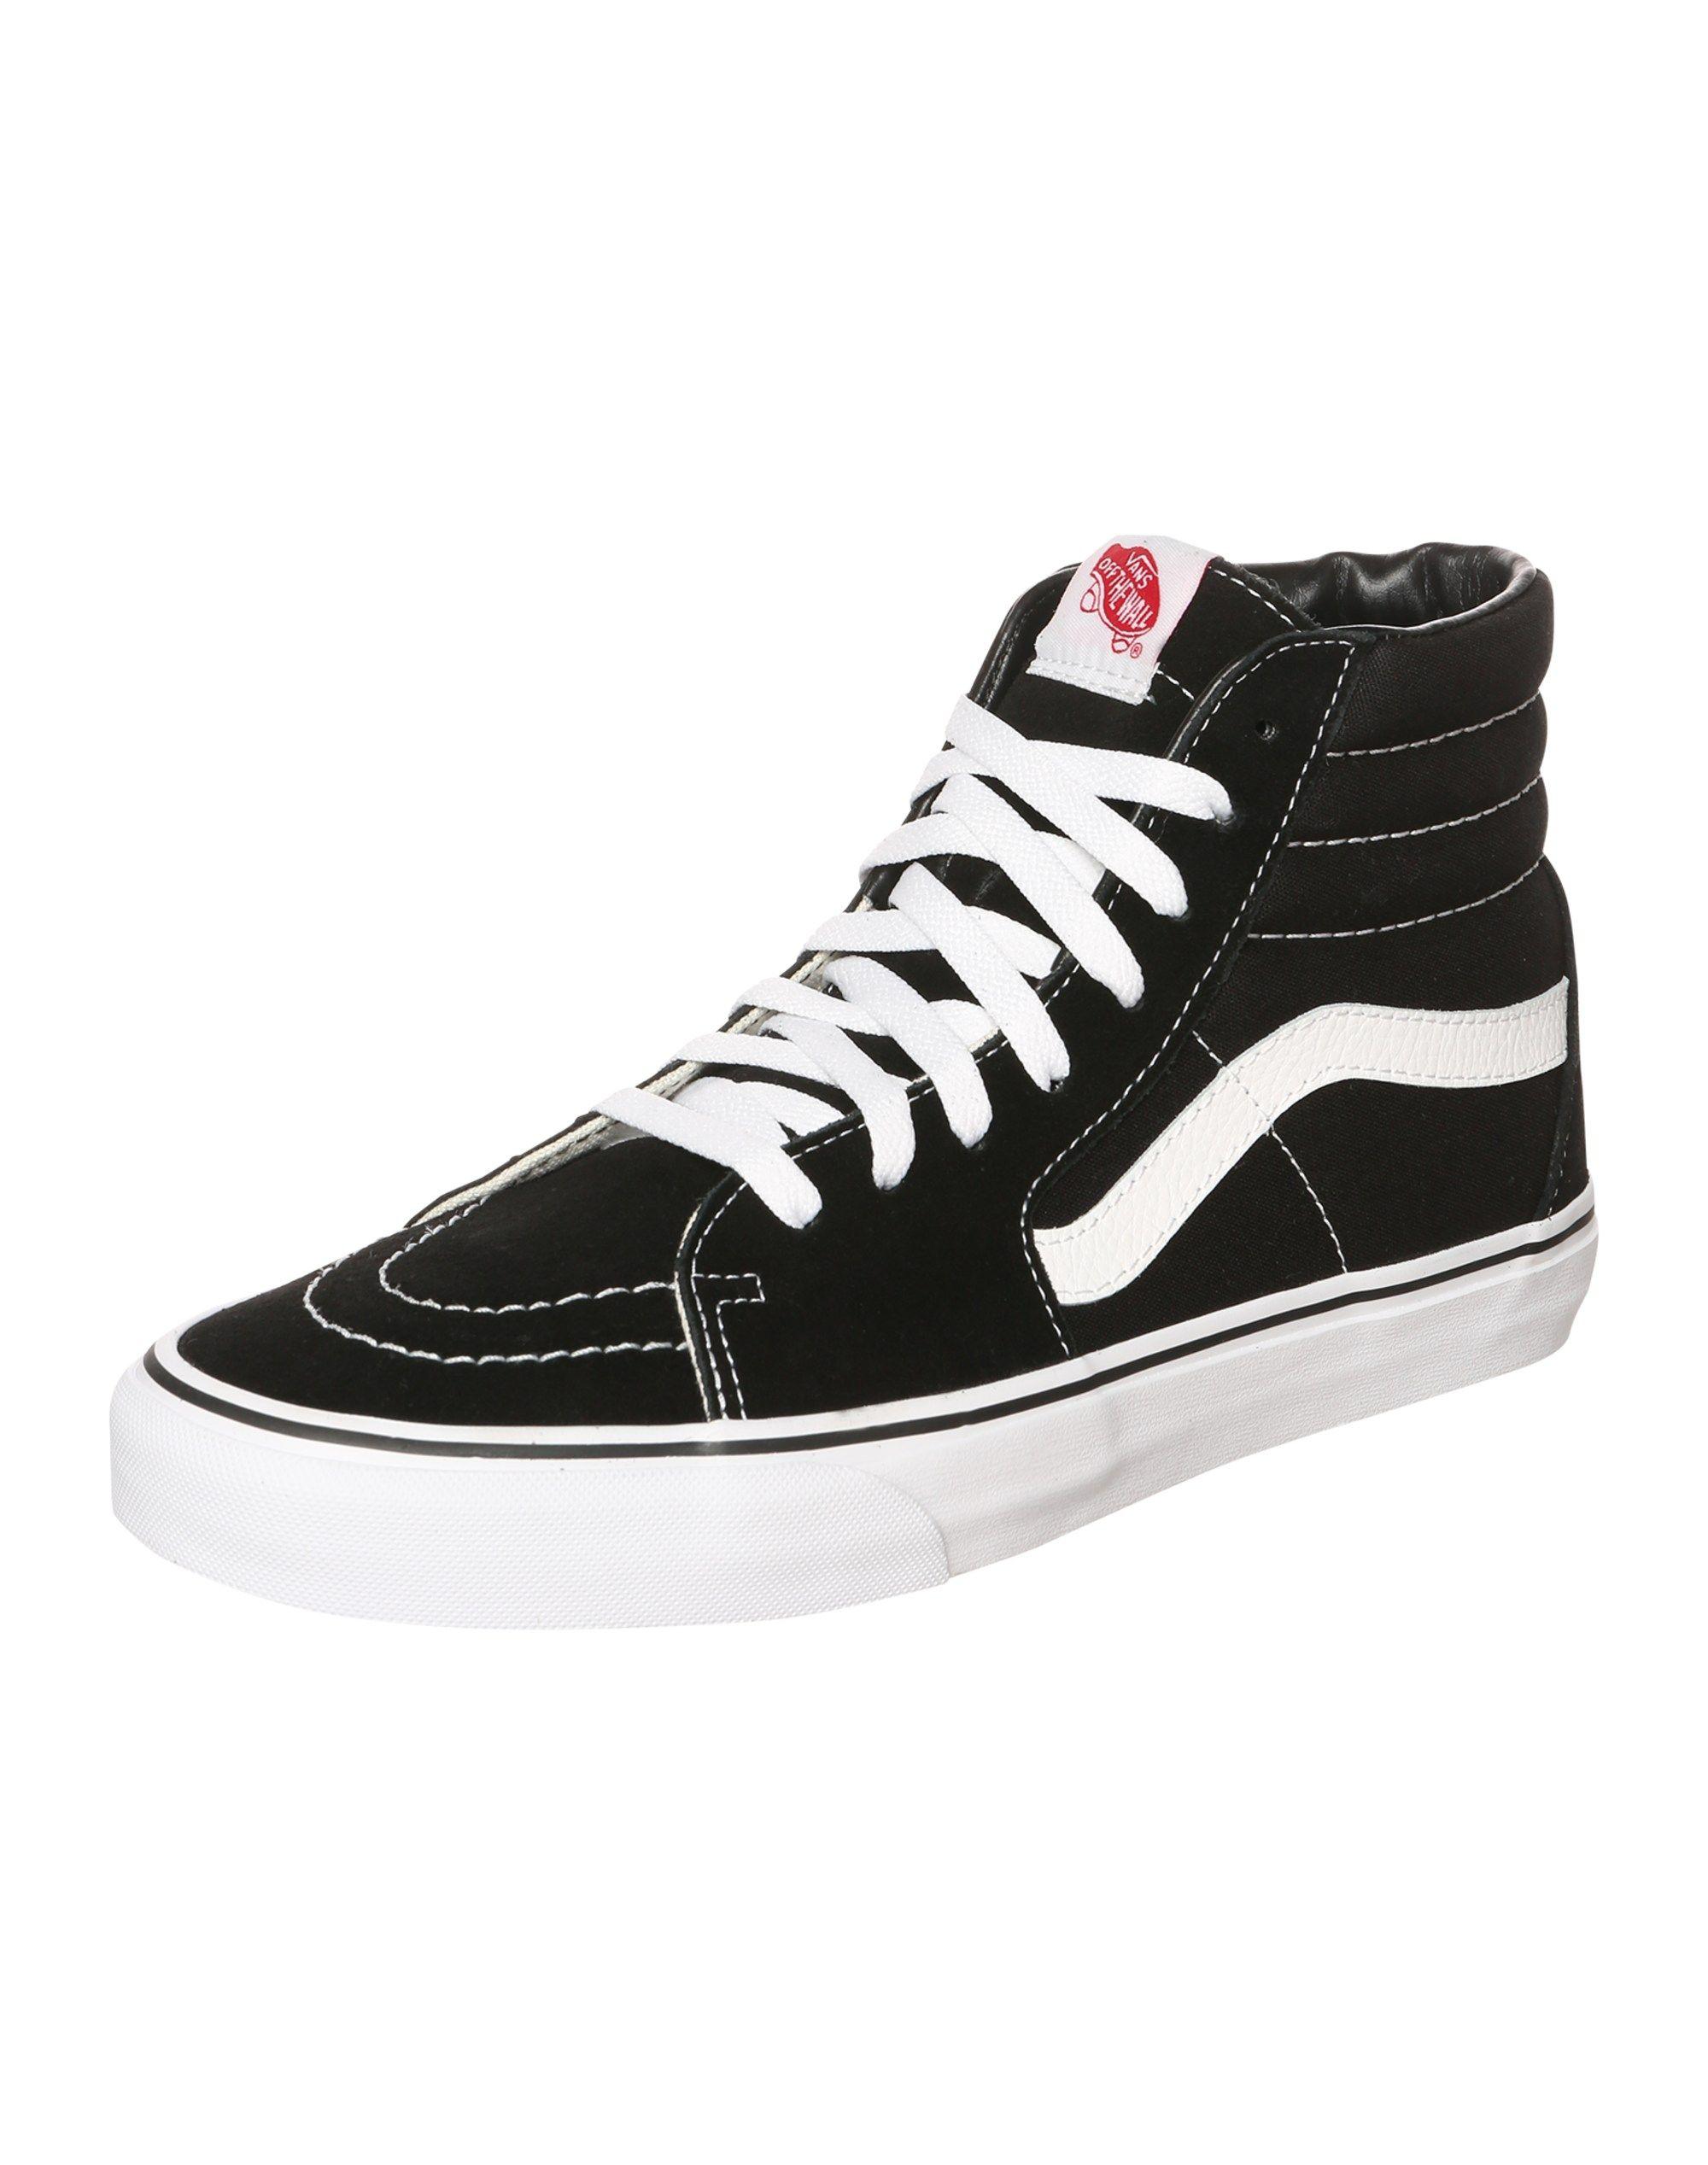 Weiß Schwarz Damen Hi Vans Sk8 Kategorie High Top Sneaker pqrxp6n